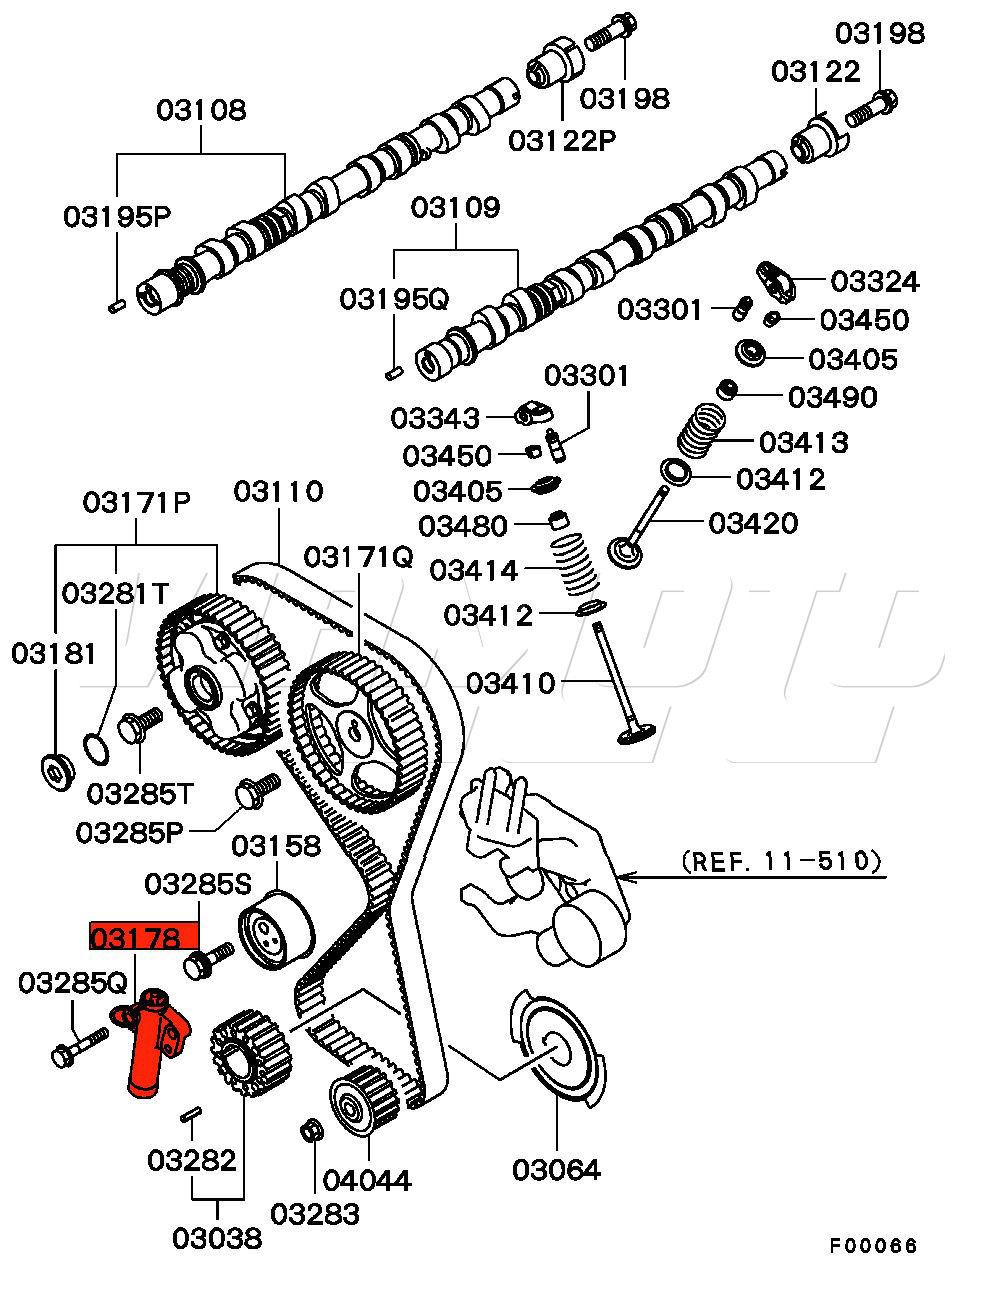 medium resolution of viamoto mitsubishi car parts hydraulic cambelt tensioner rh viamoto co uk evo engine schematic diagram of 2006 harley davidson motor